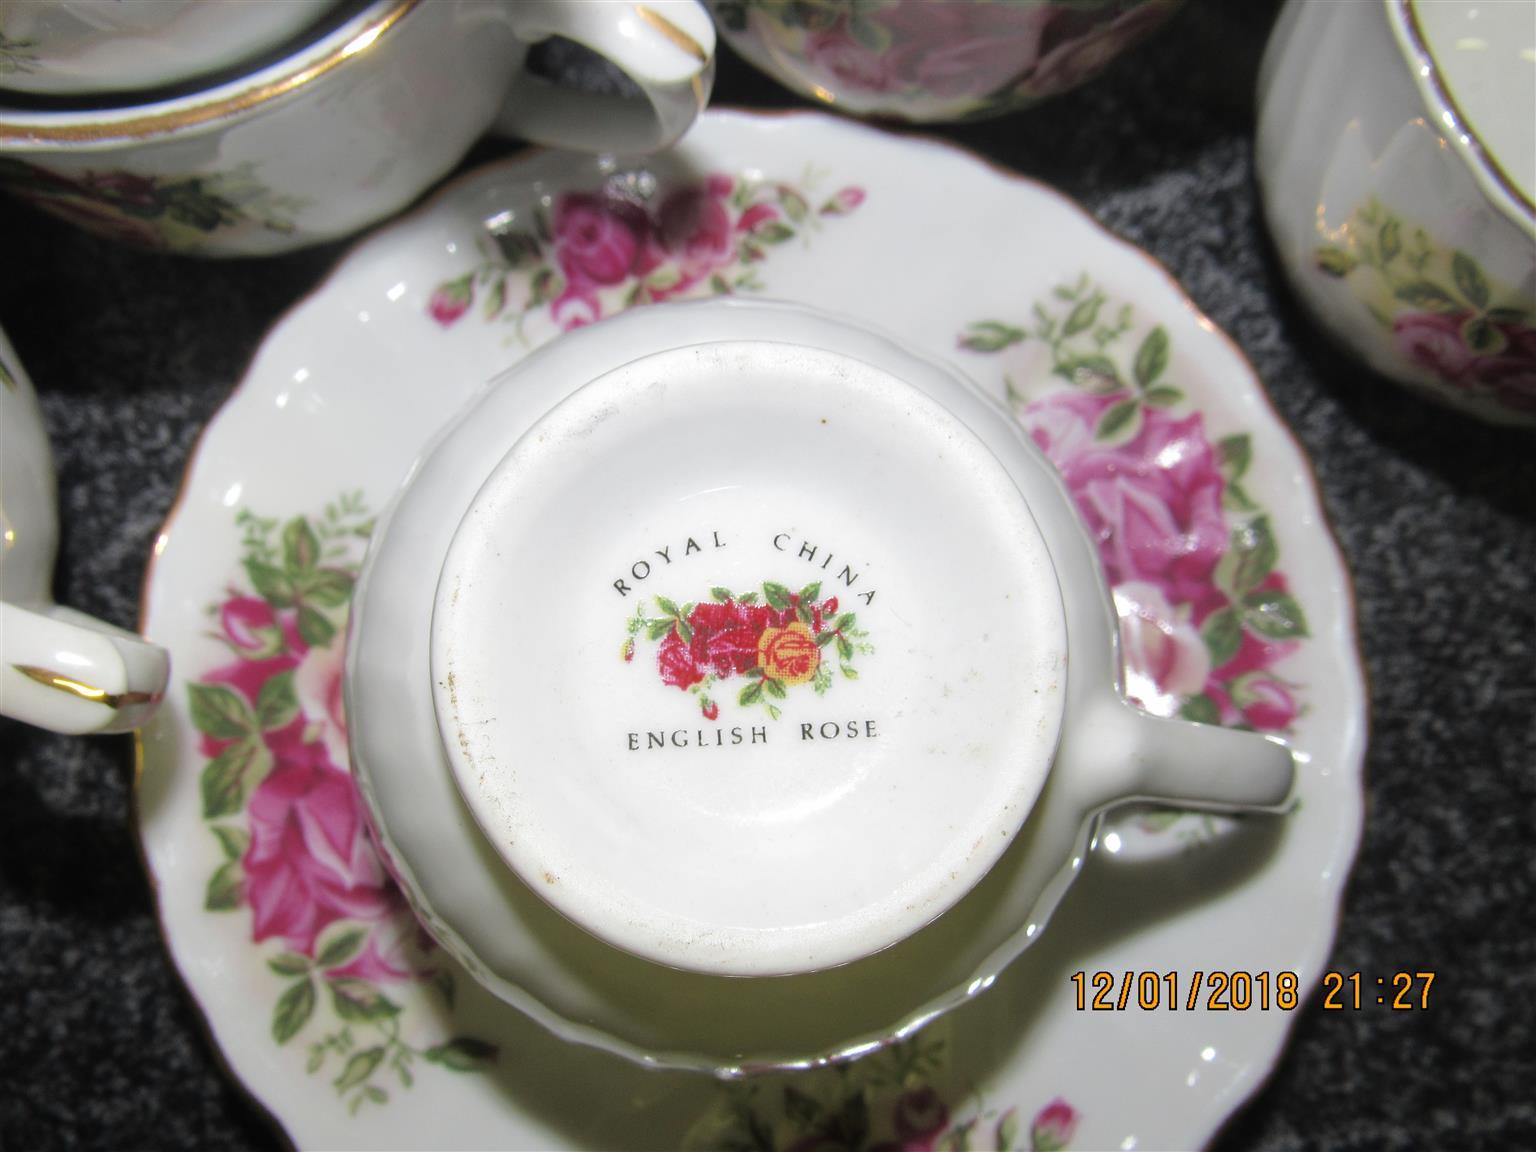 Royal China English Rose Tea Set (88 - Pcs)